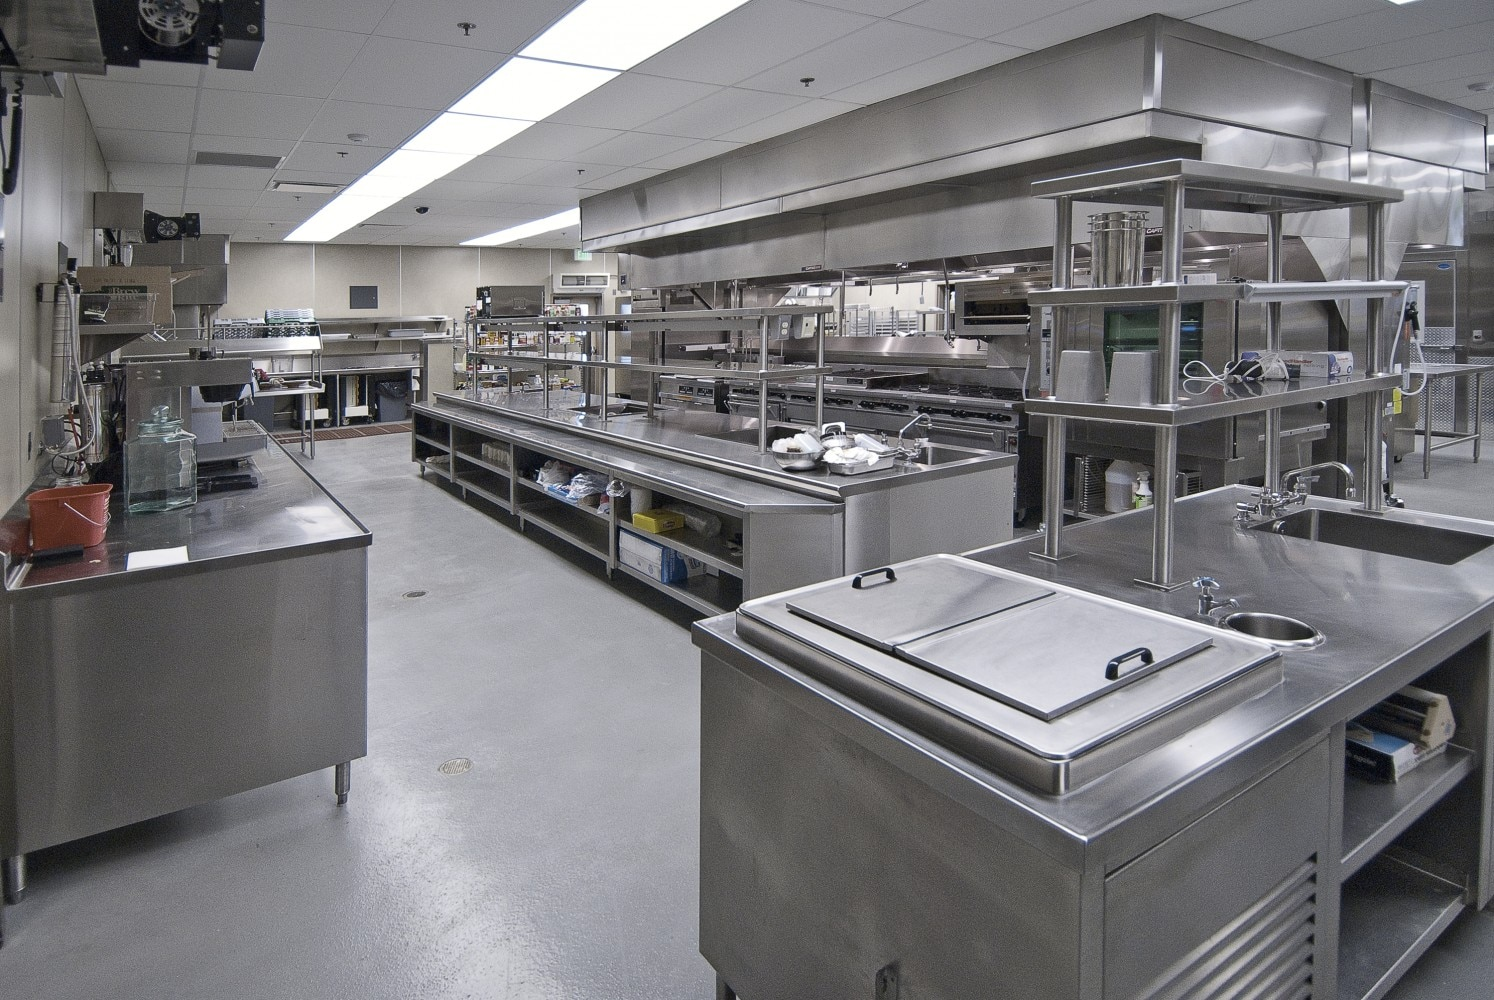 NRS KITCHEN PVT LTD   Commercial Kitchen Equipment Manufacturers